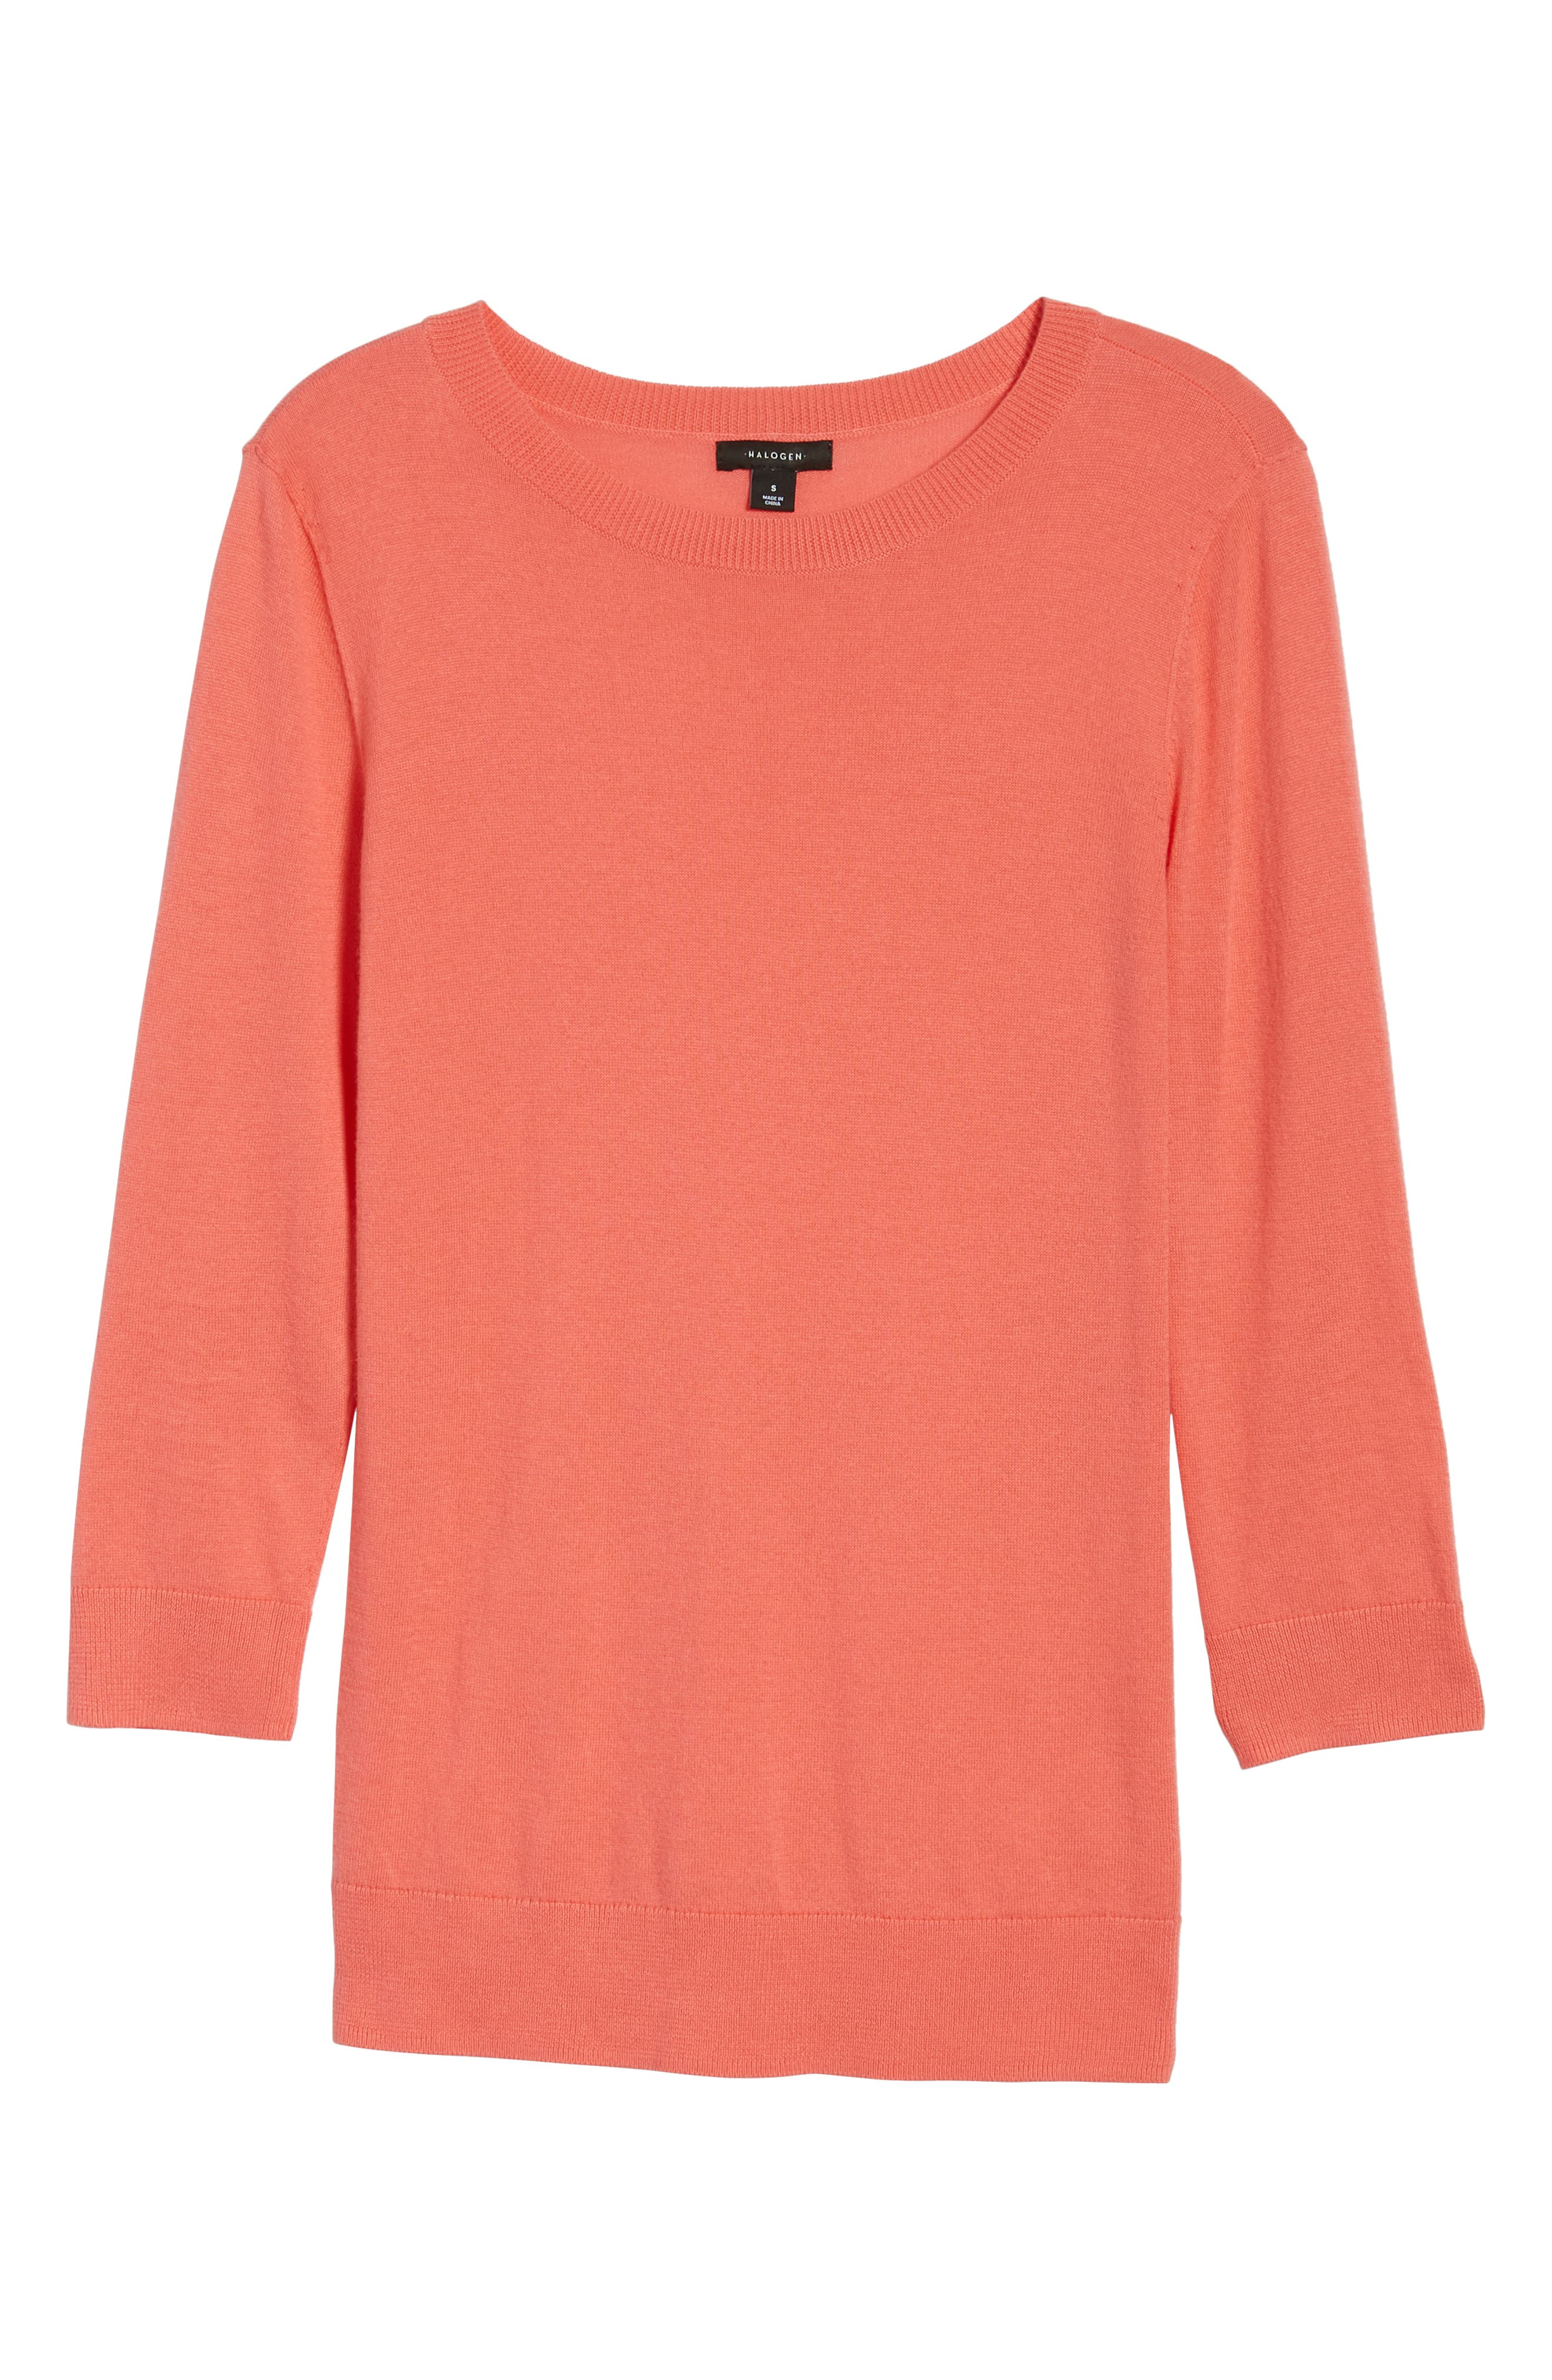 Cotton Blend Pullover,                             Alternate thumbnail 157, color,